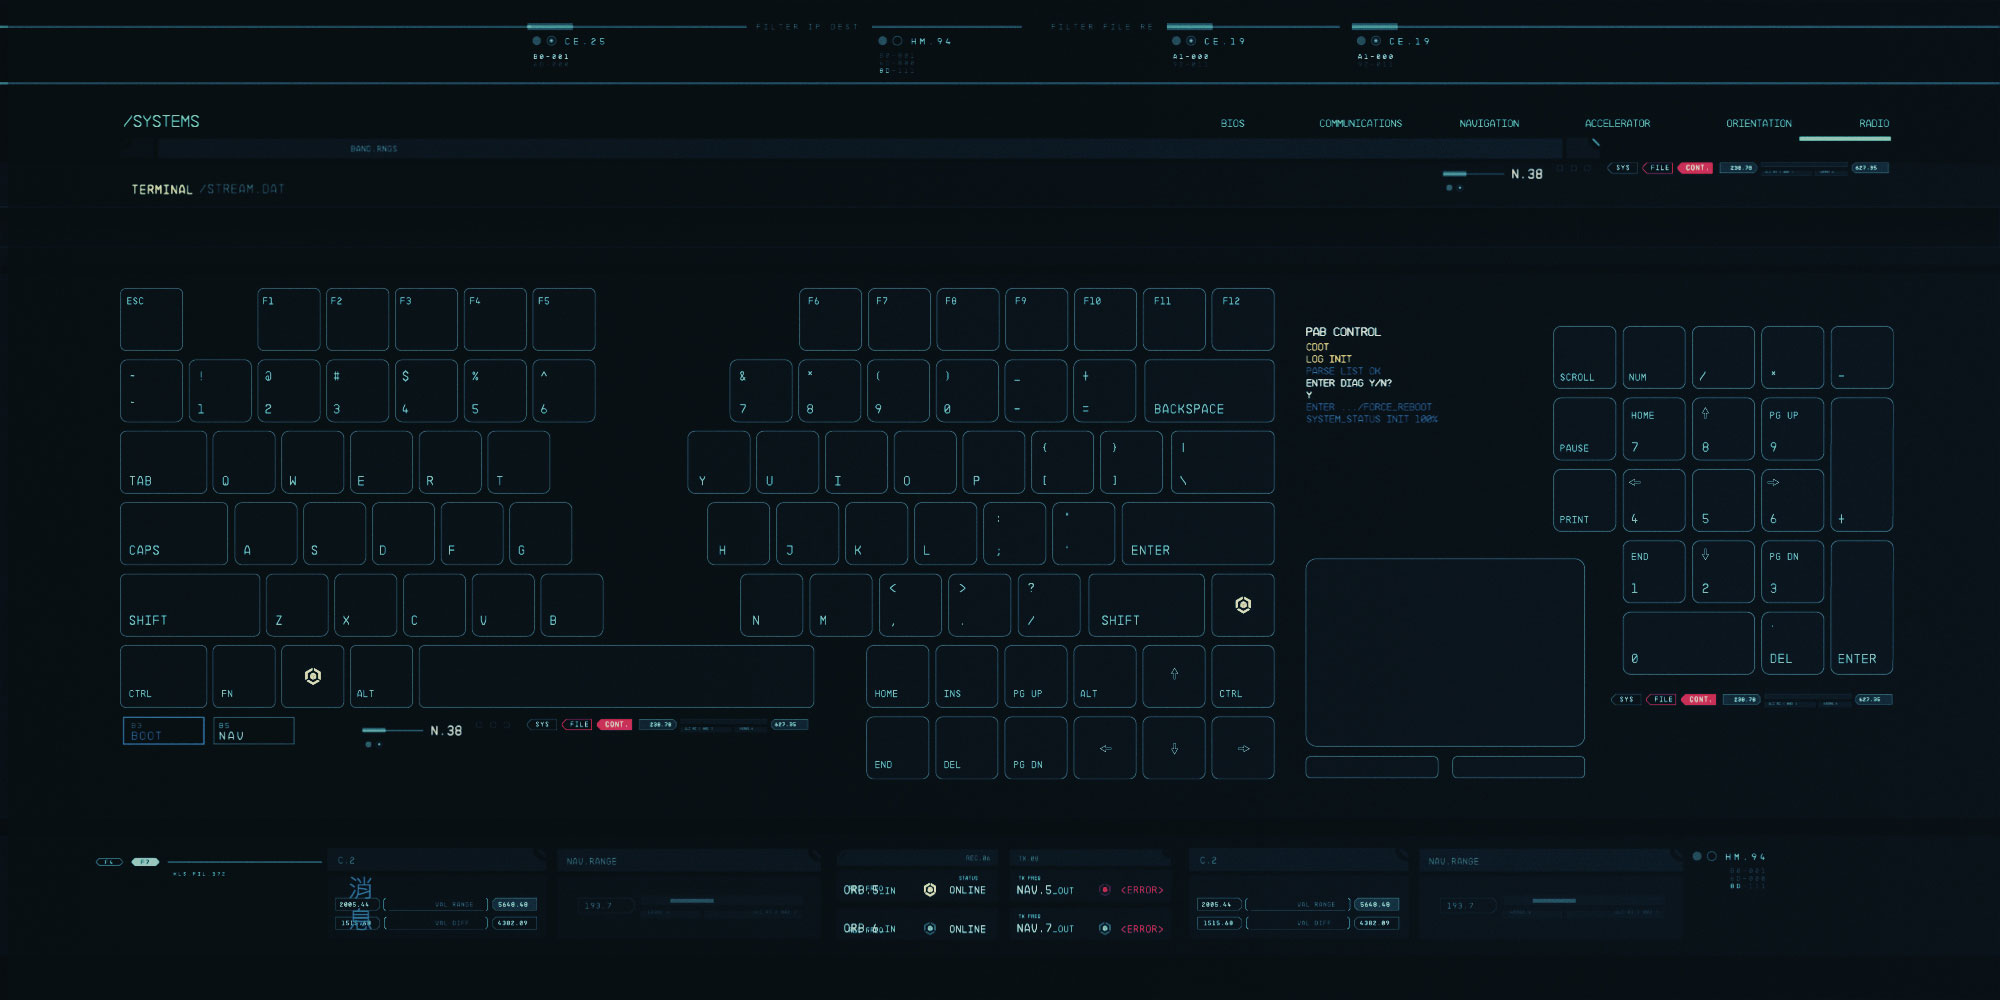 vidchat_keyboard_gfx_v001